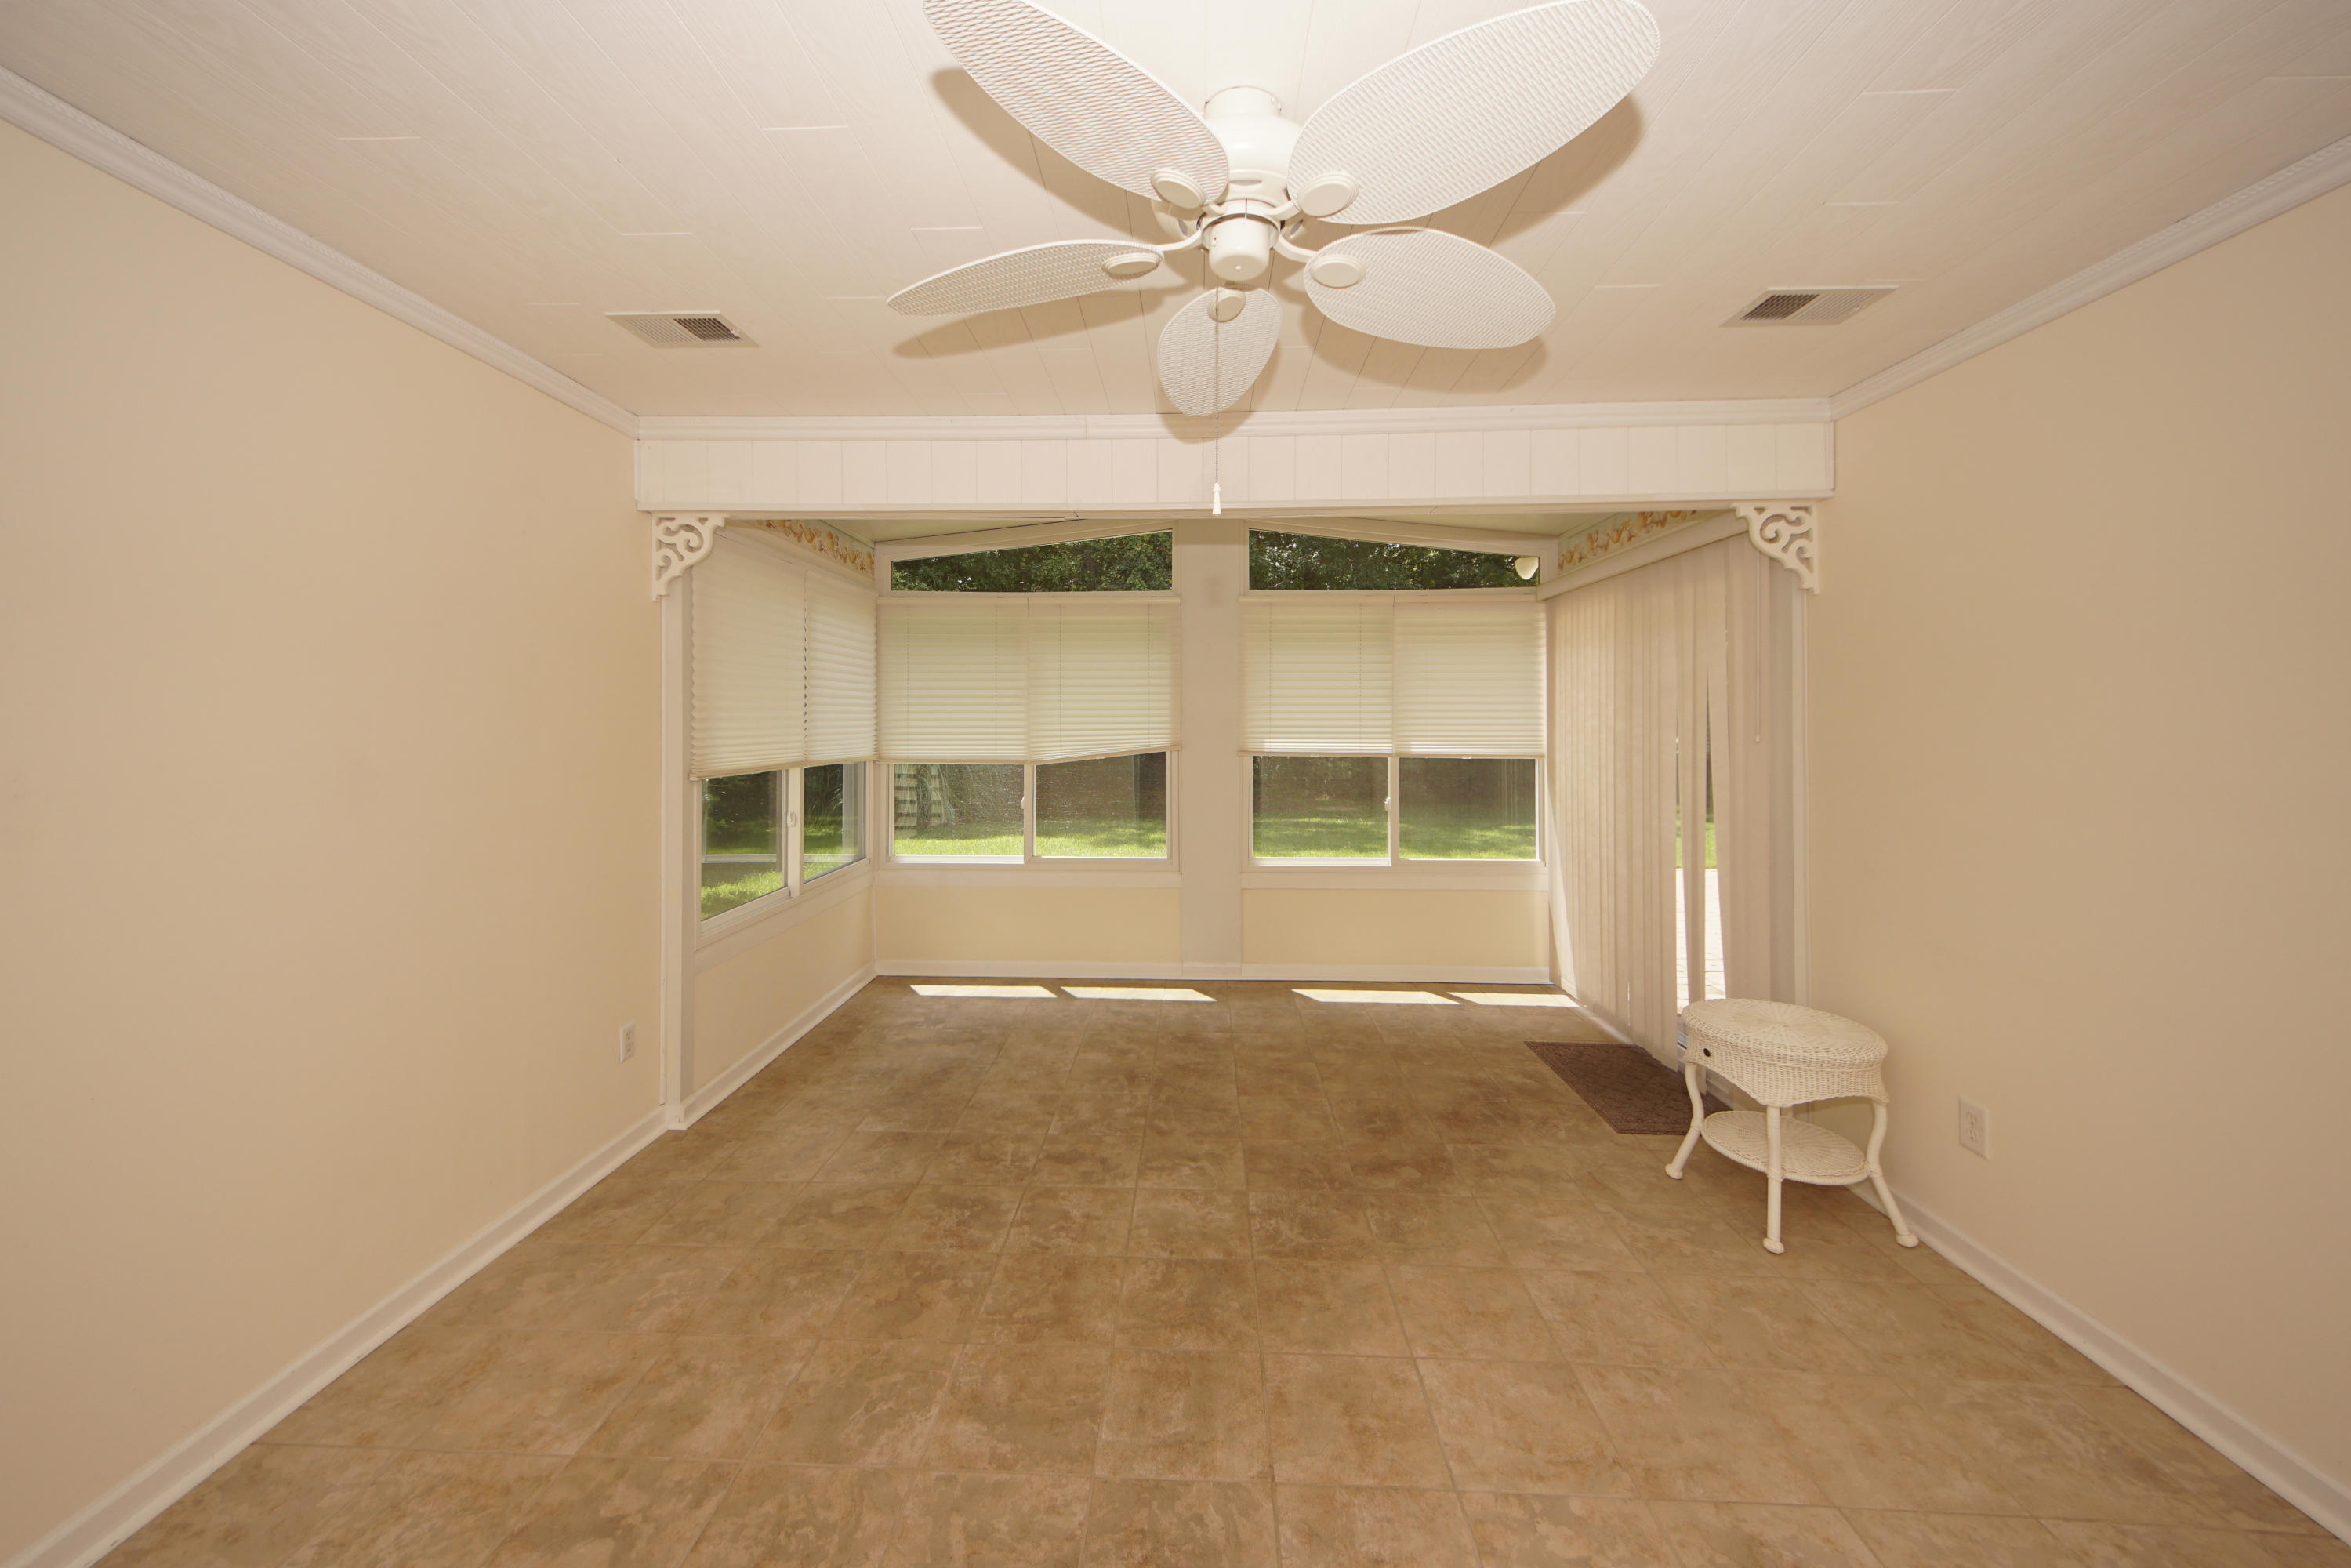 Park West Homes For Sale - 1464 Wellesley, Mount Pleasant, SC - 8